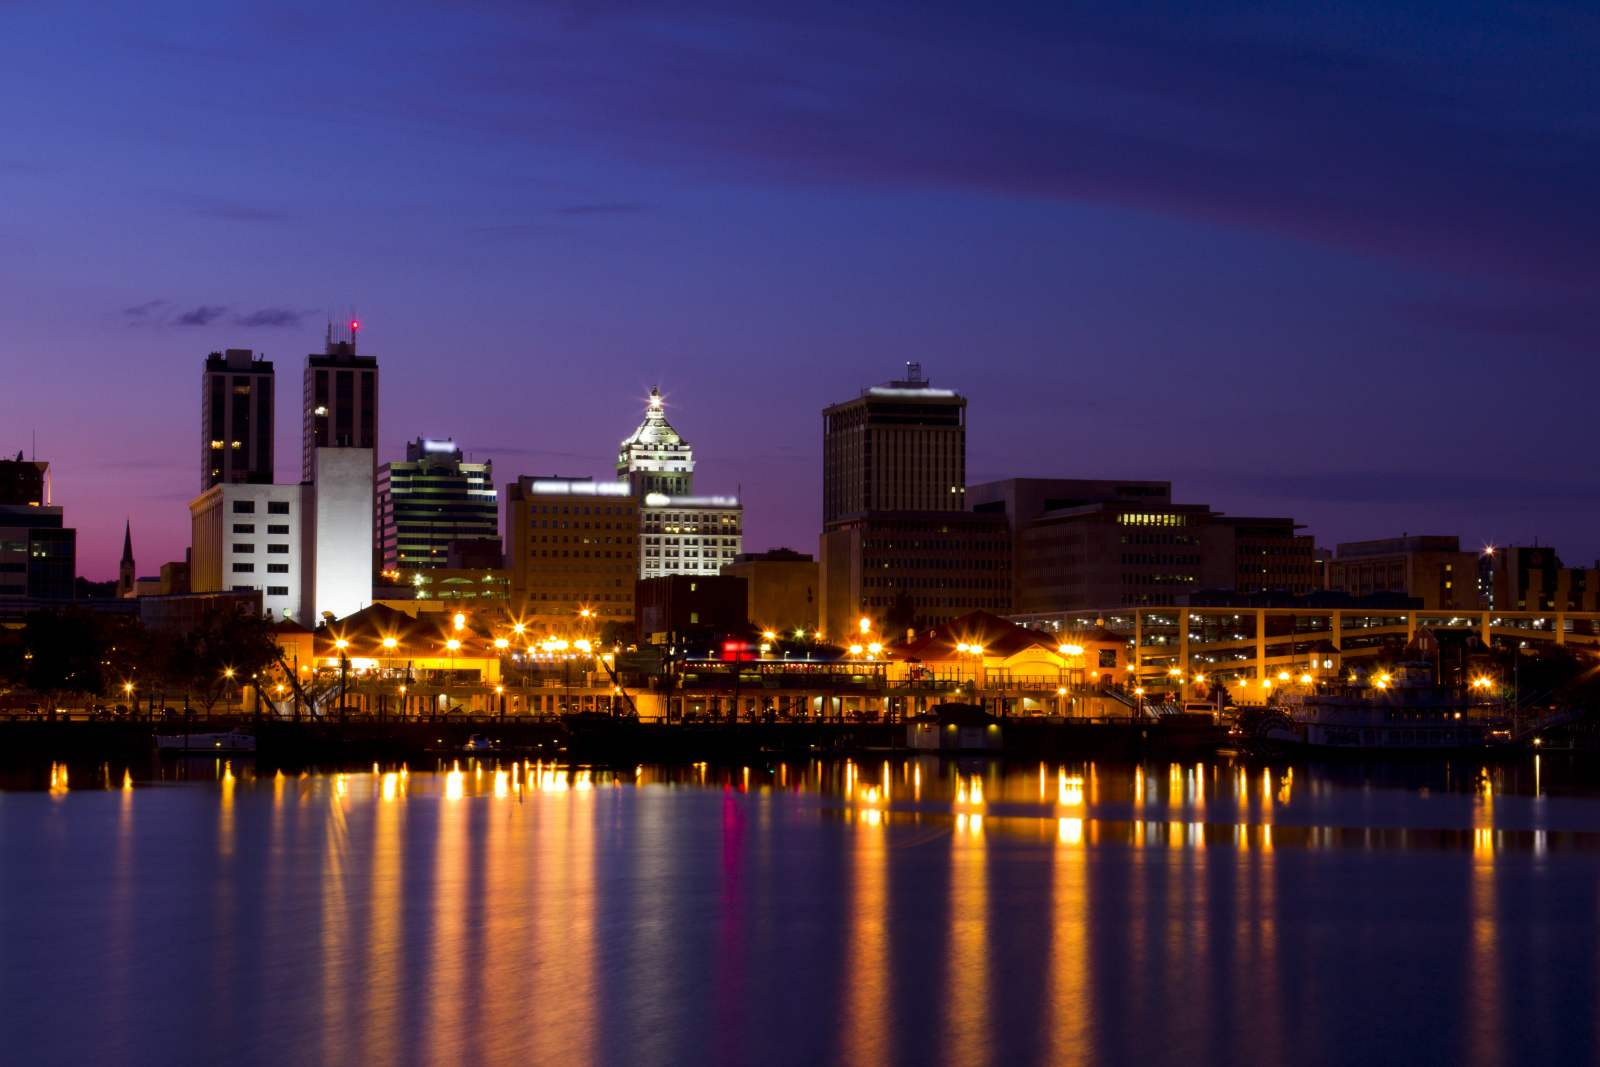 Peoria skyline